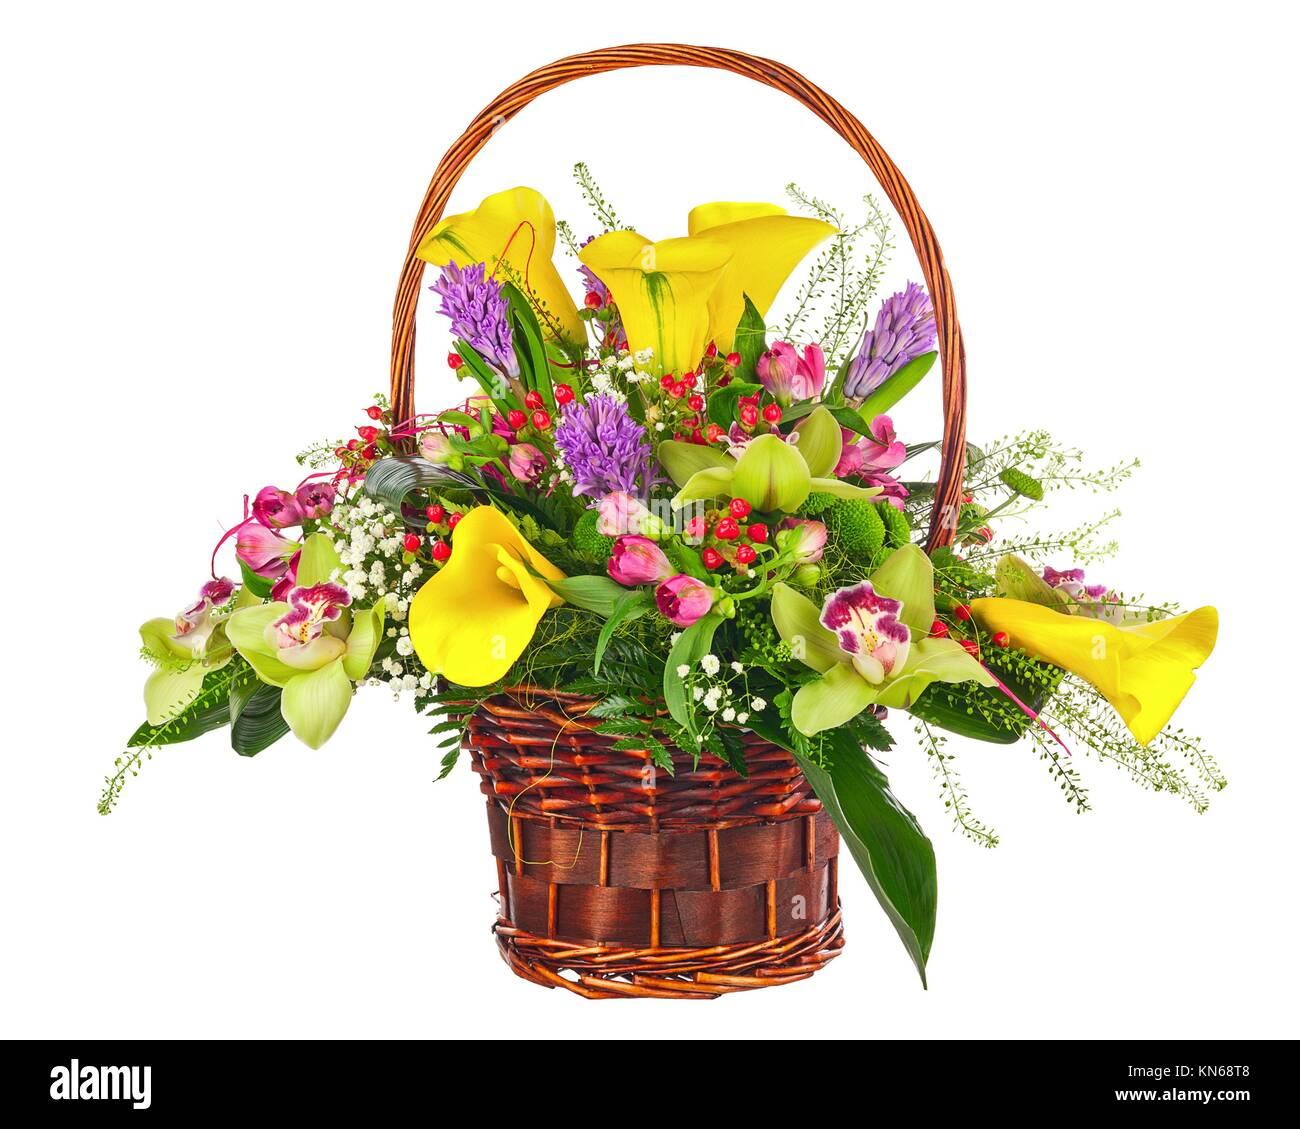 Colorful flower bouquet arrangement centerpiece in wicker